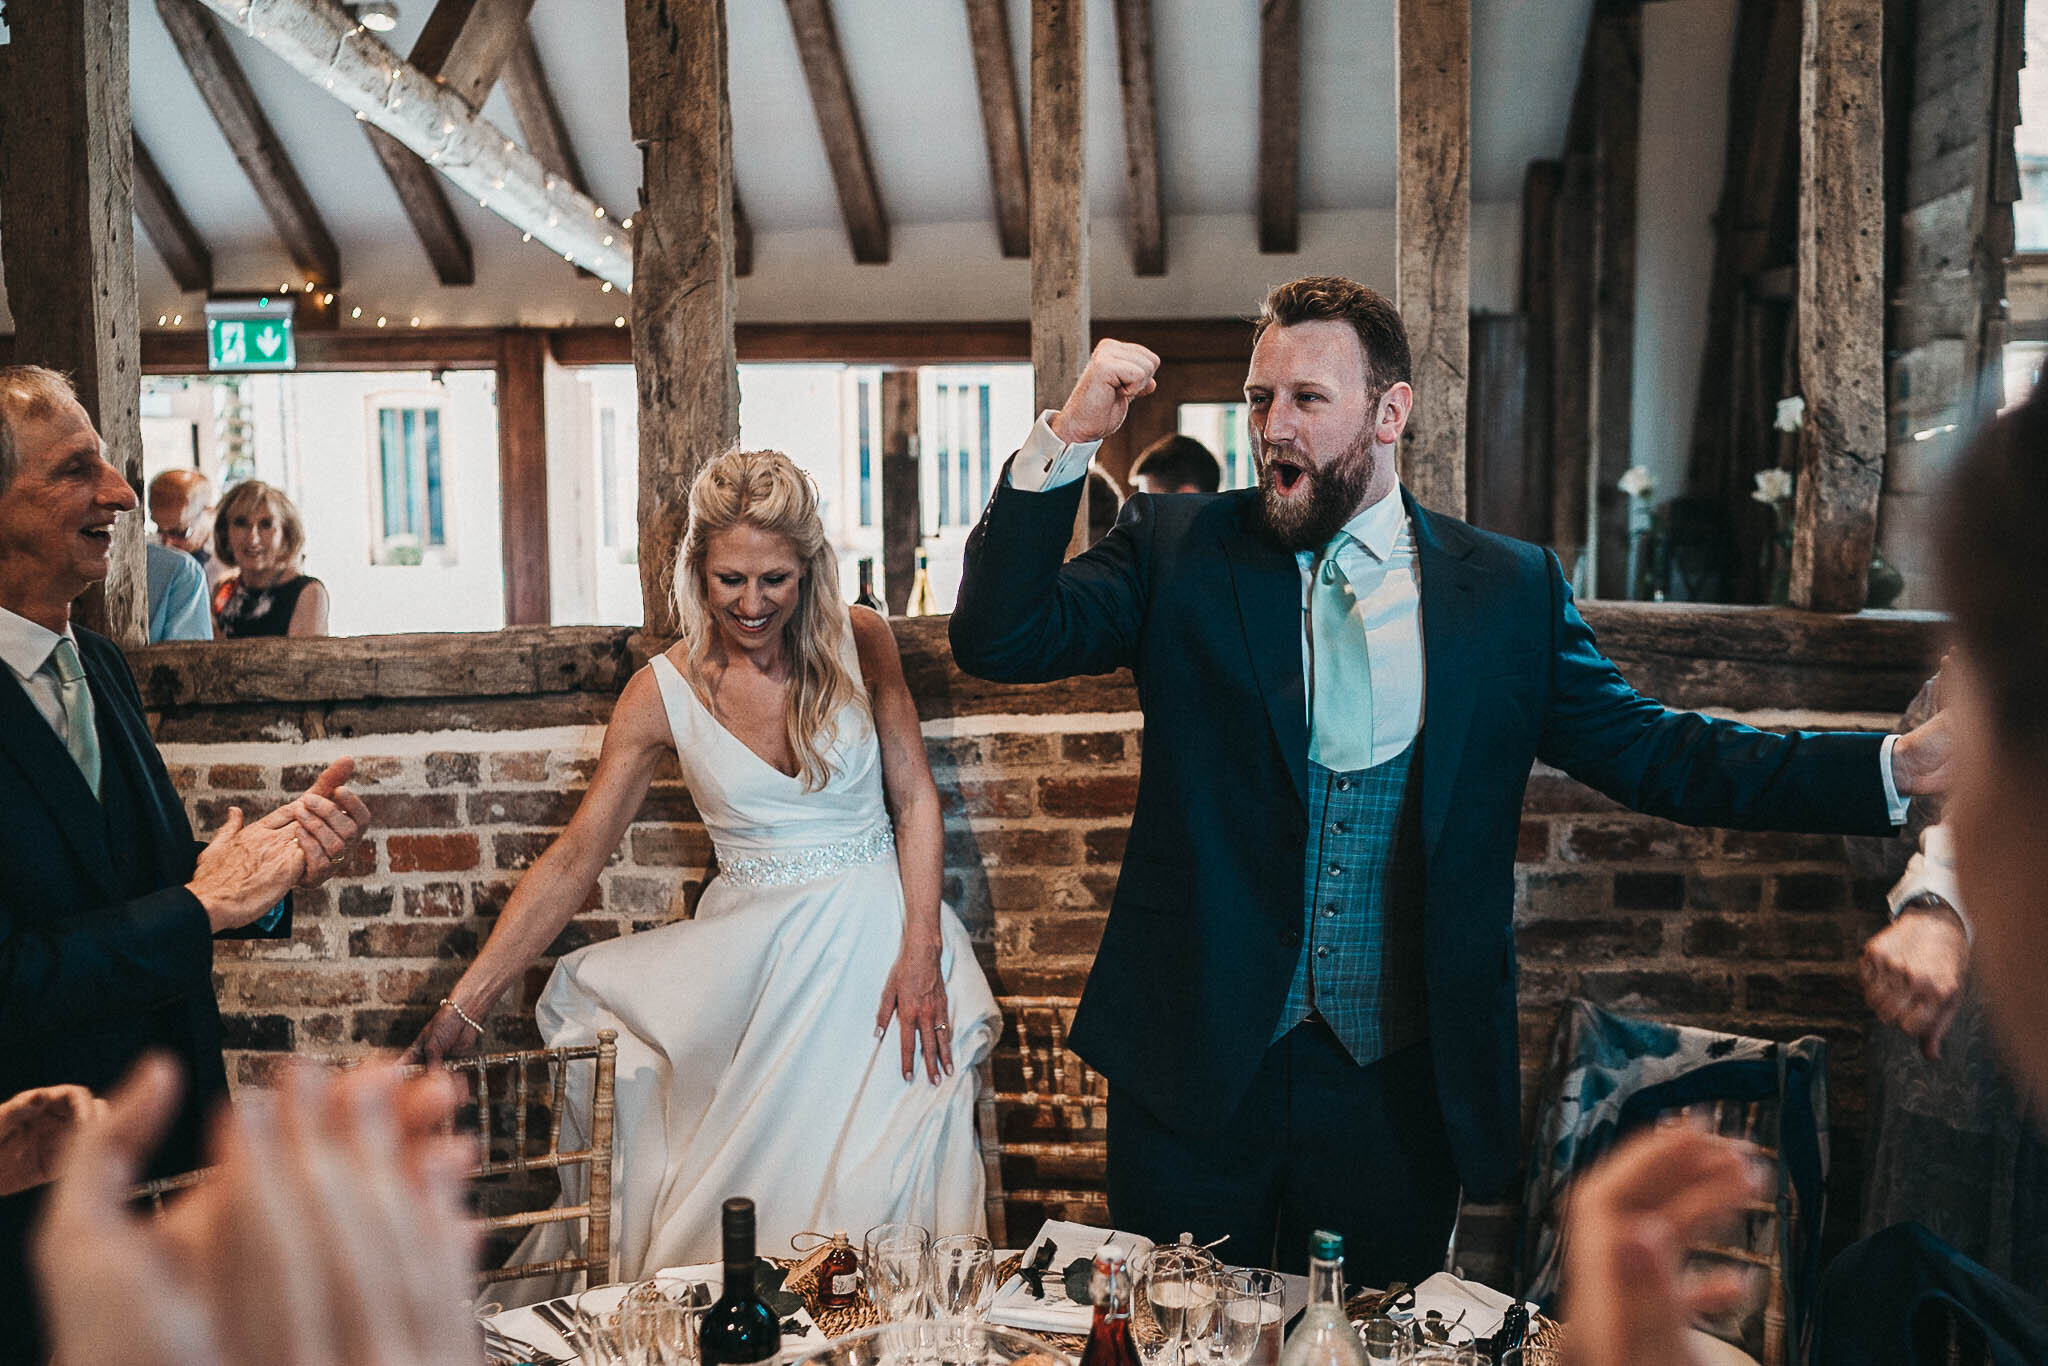 bride-and-groom-celebrating